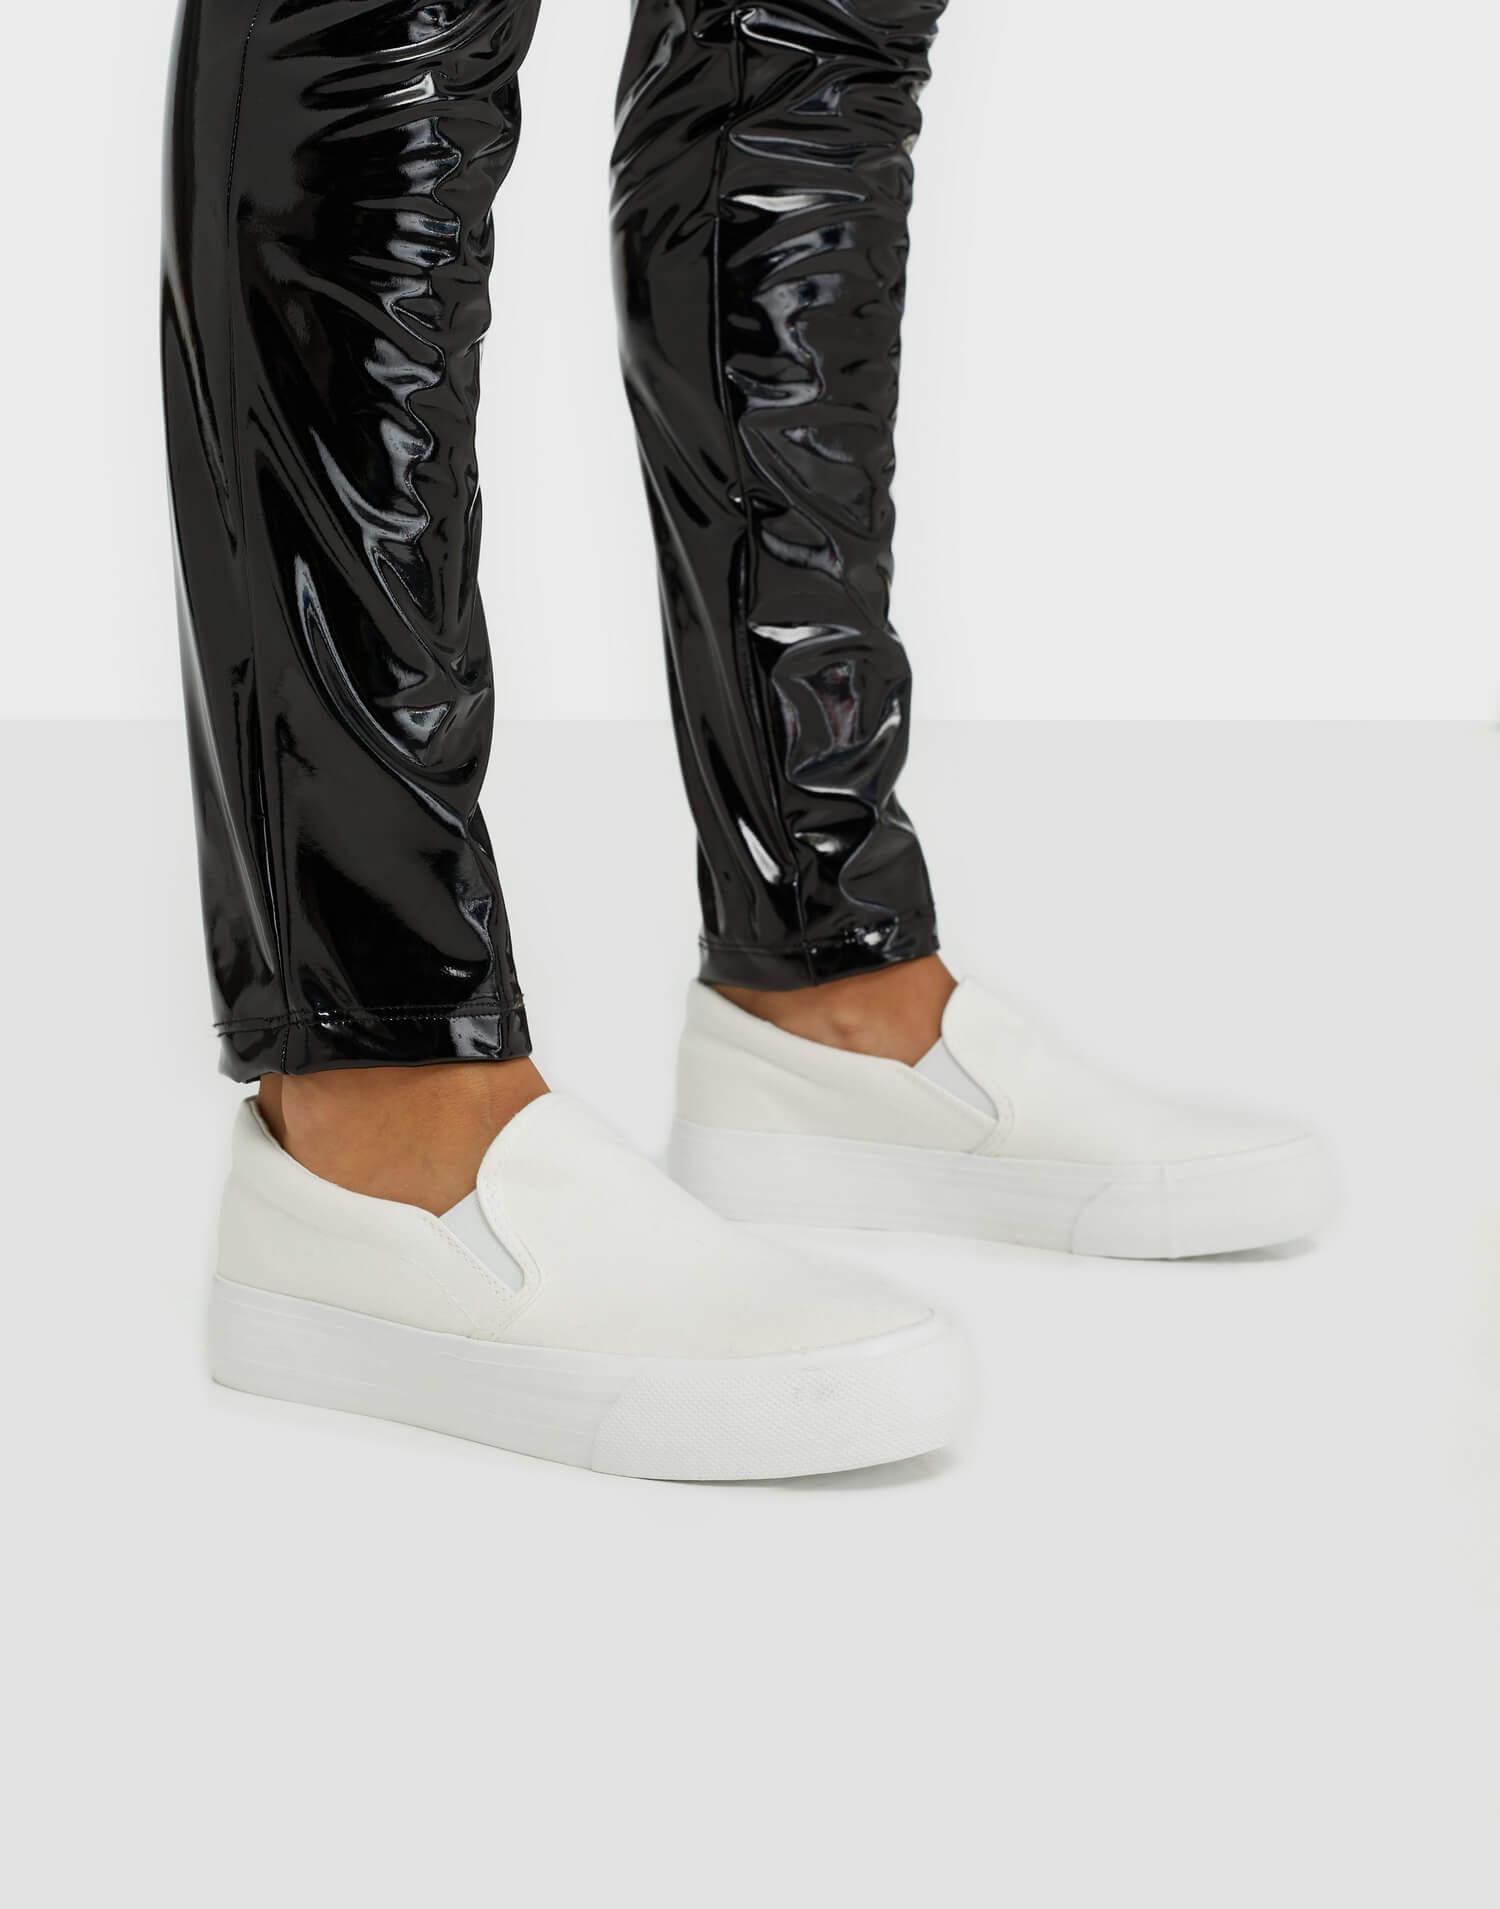 Vita slip on-sneakers från Duffy.